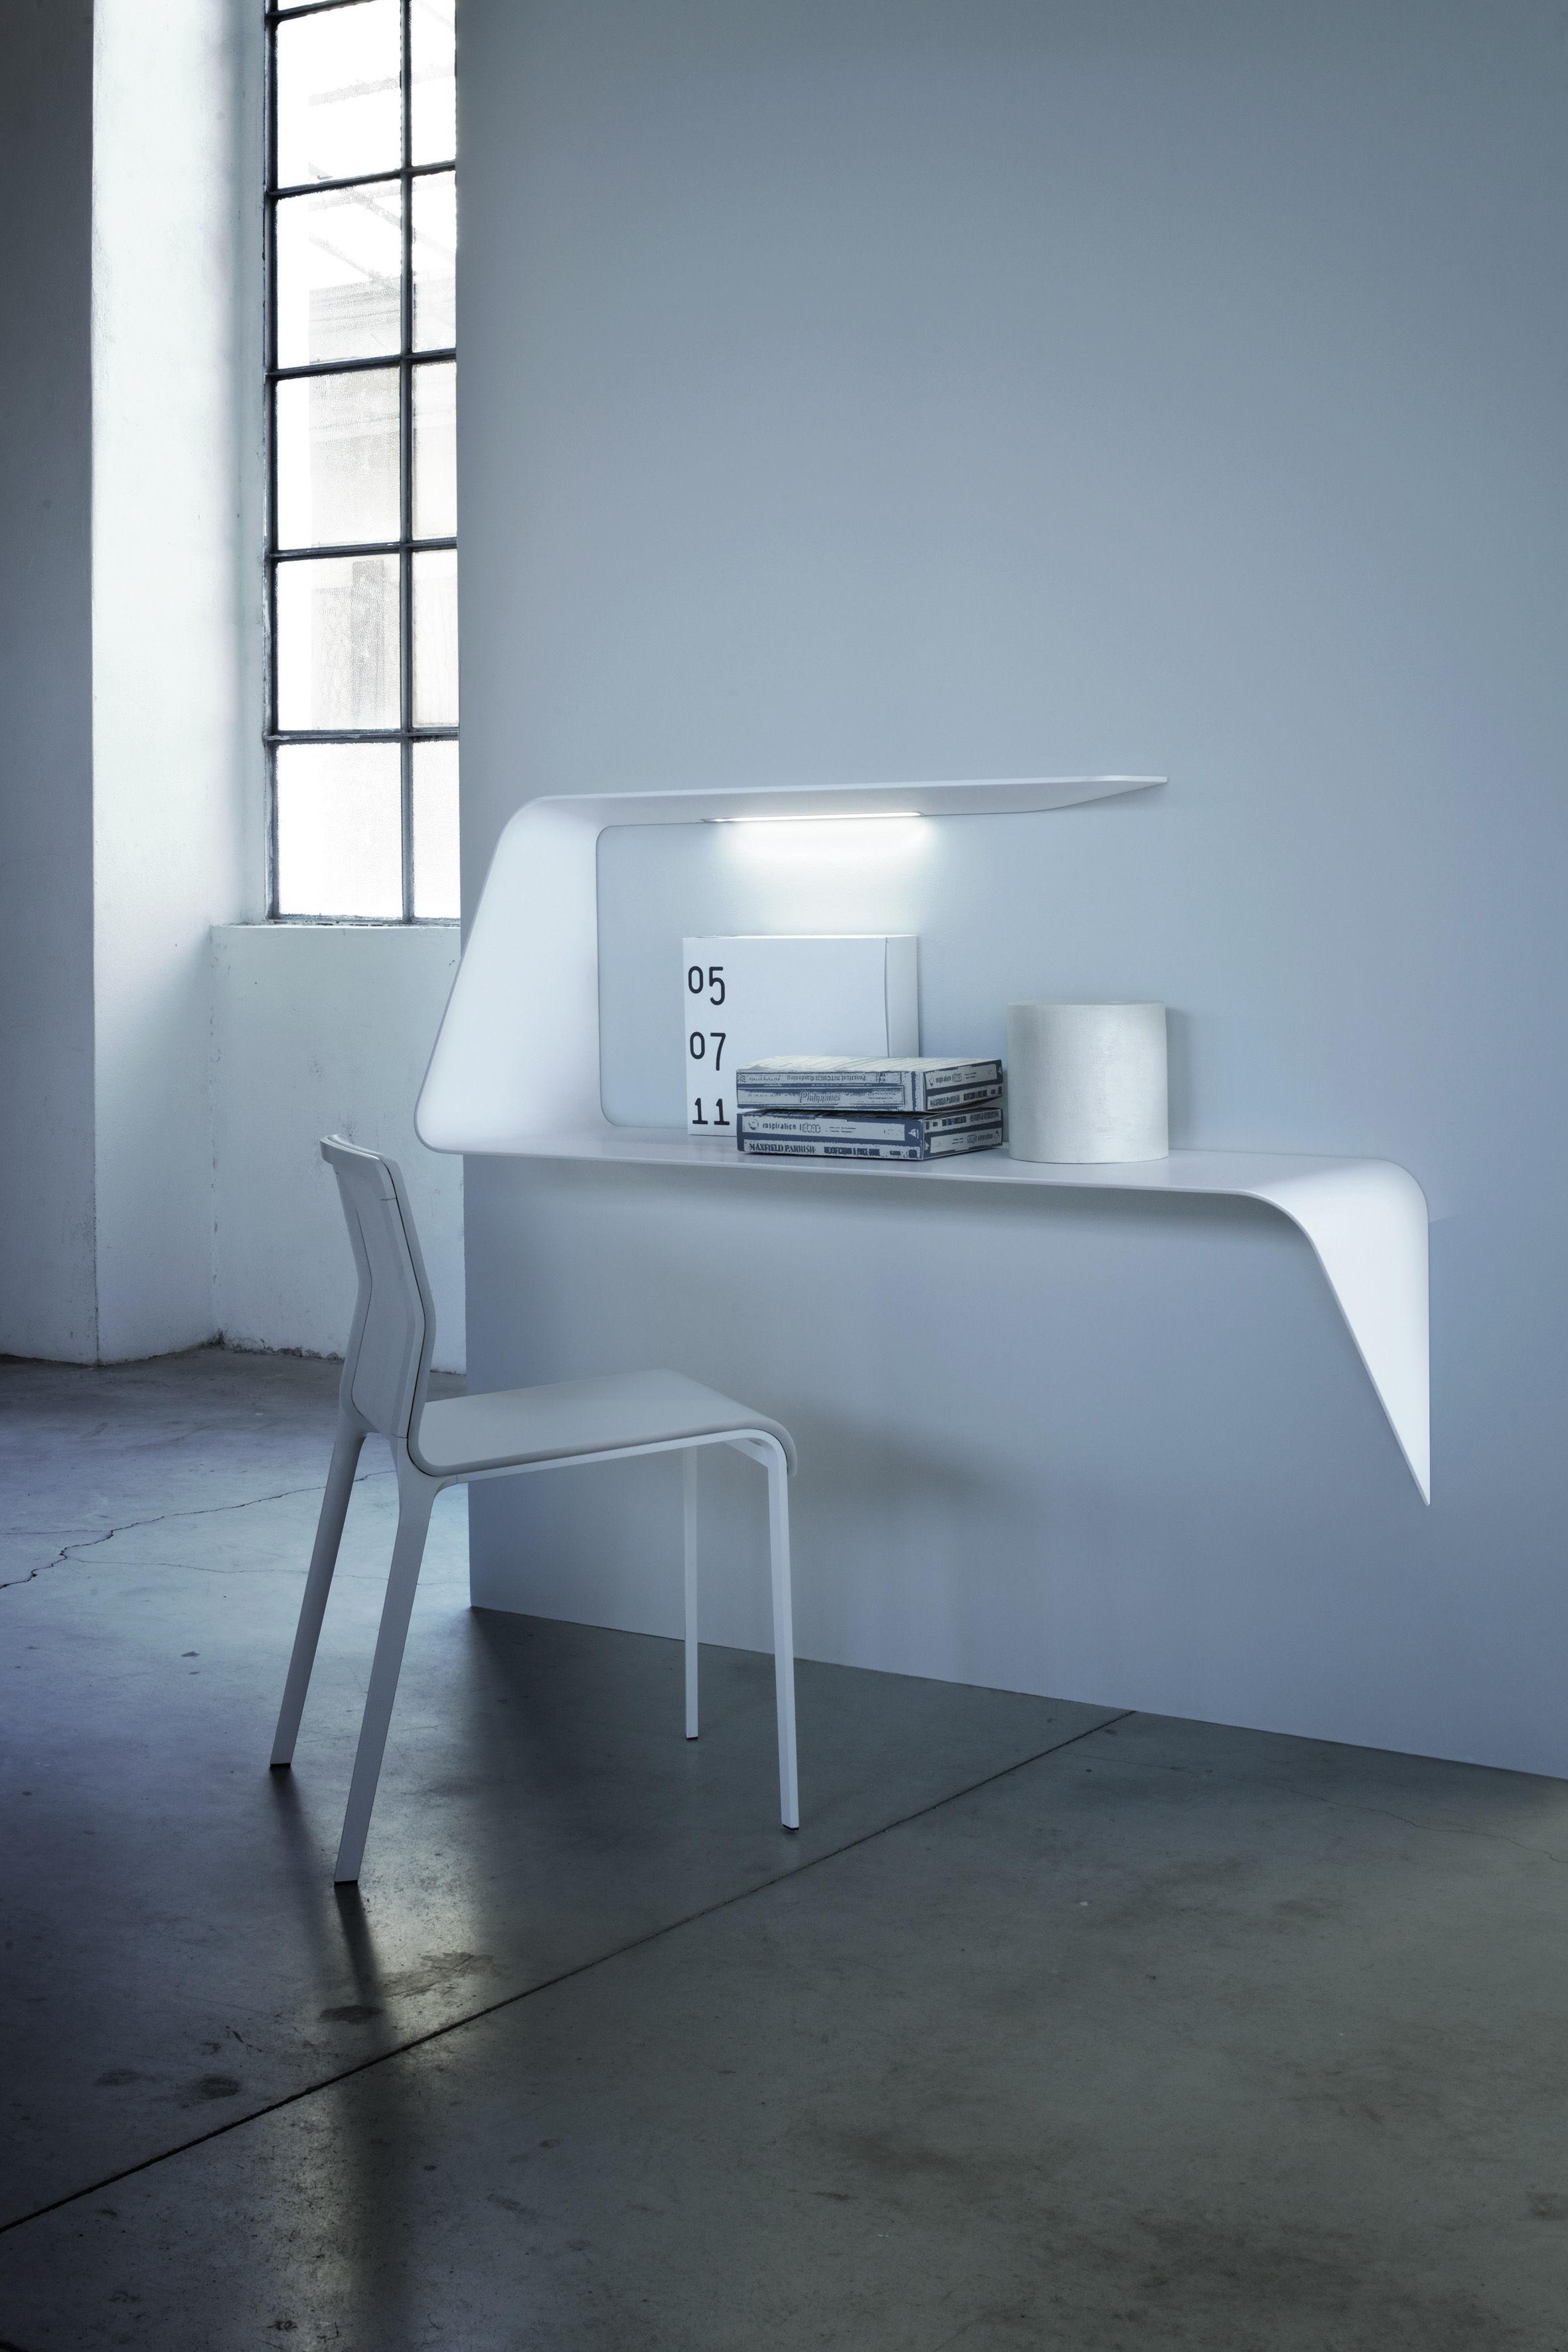 bureau mamba tag re angle droite l 135 x h 93 cm blanc angle droite mdf italia. Black Bedroom Furniture Sets. Home Design Ideas